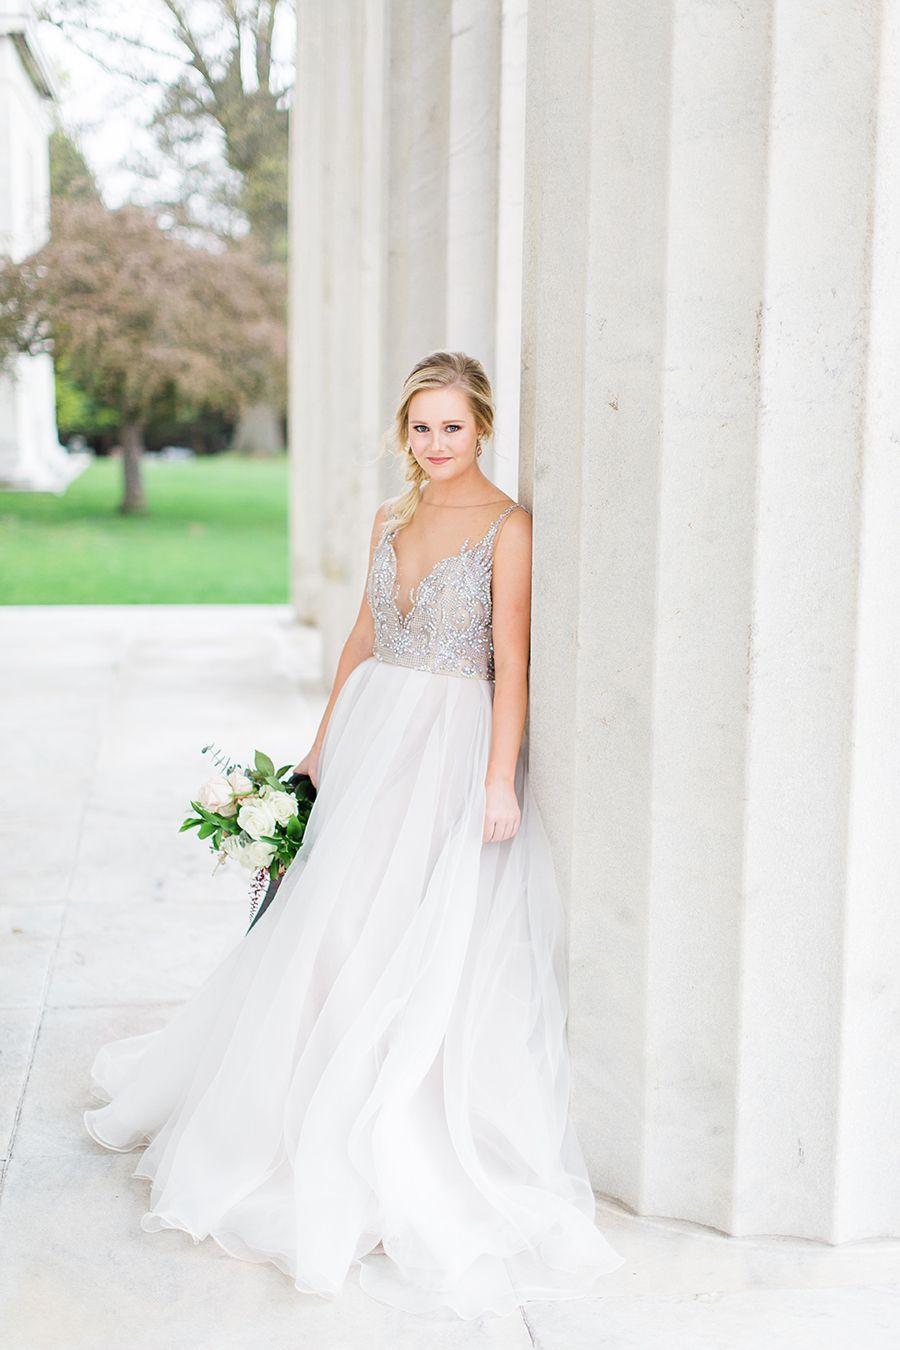 Effortless Wedding Day Glam in Pewter and Pastels | Weddingideas ...